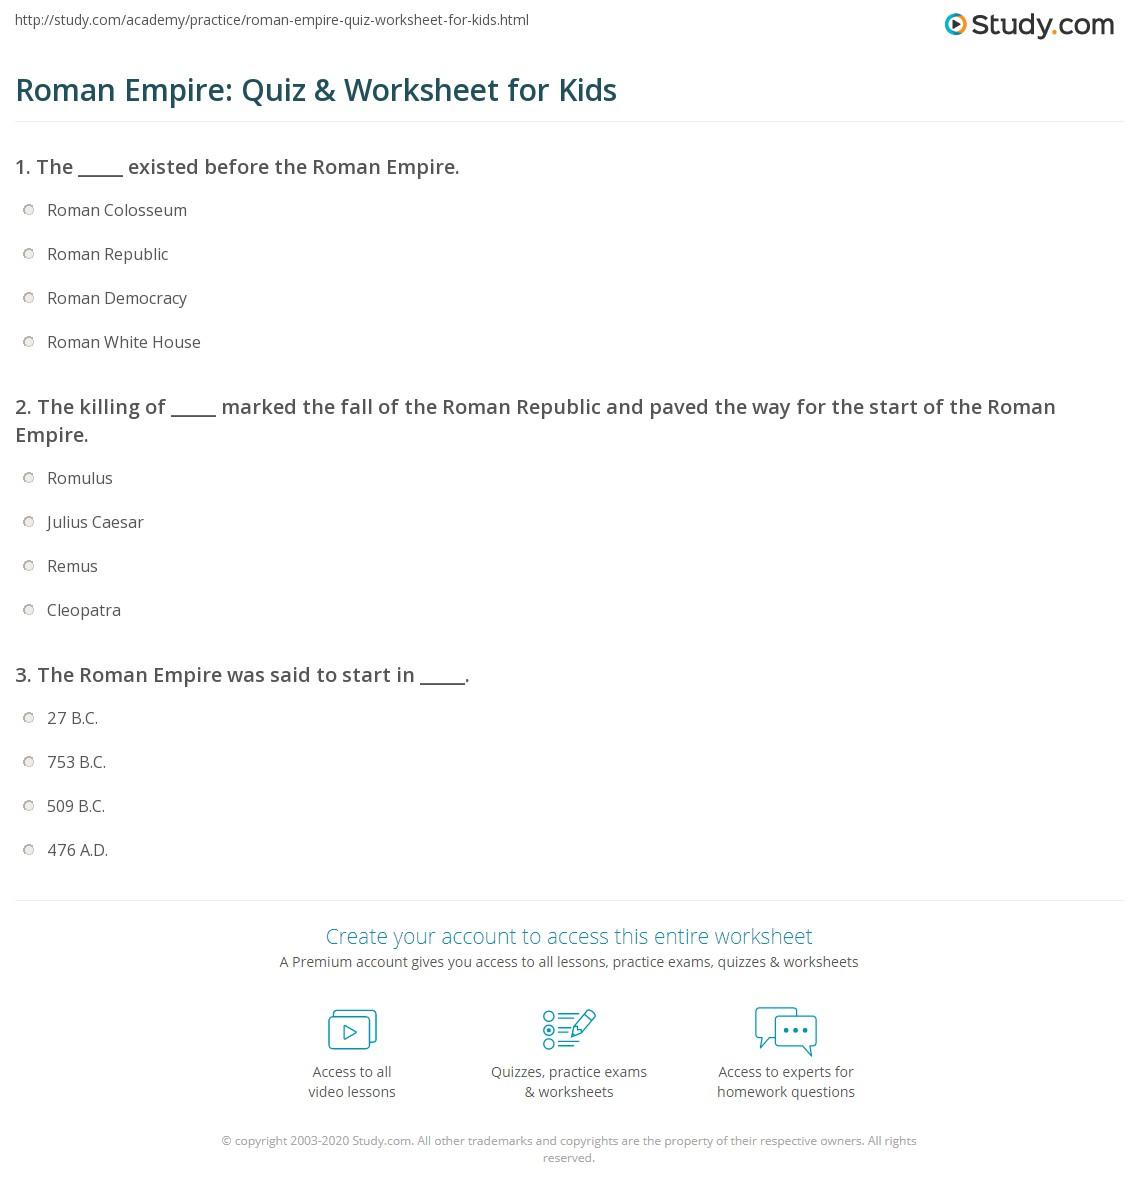 Rom N Empire Quiz W Ksheet Kids Study